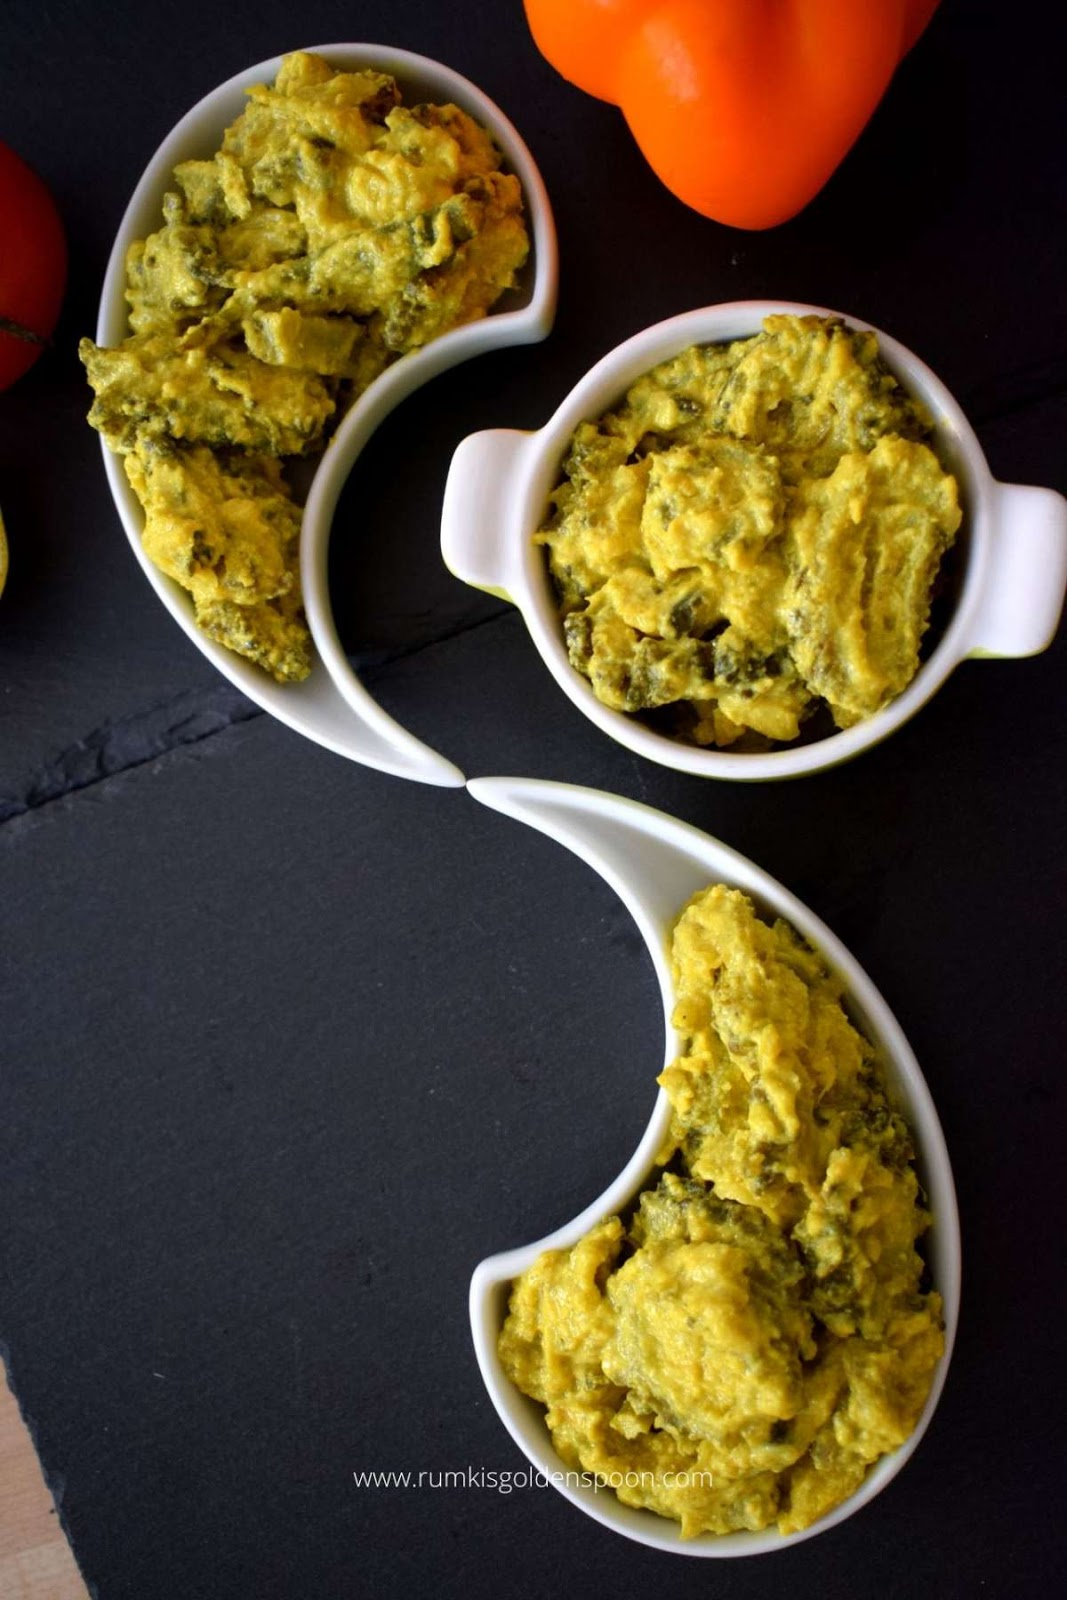 uchhe korola, uchhe karola, shorshe korola, shorshe karola, bitter gourd in mustard sauce, korola recipe, karola recipe, uchhe recipe, bengali uchhe recipe, korola ranna recipe, bangladeshi korola recipe, korola recipe Bengali, korola bhaji recipe, korola vorta recipe, korola bhaja recipe, tita korola recipe, korola vaji recipe, recipe for karela fry, karela ki recipe, karela recipe, karela recipe Indian, karela recipe without onion, karela veg recipe, Karela recipe, bitter gourd recipe, bitter melon recipe for diabetes, bitter melon recipe vegan, bengali style karela recipe, bengali recipe, bengali recipes, bengali food, bengali veg recipe, bengali veg recipes, niramish recipe, Rumki's Golden Spoon